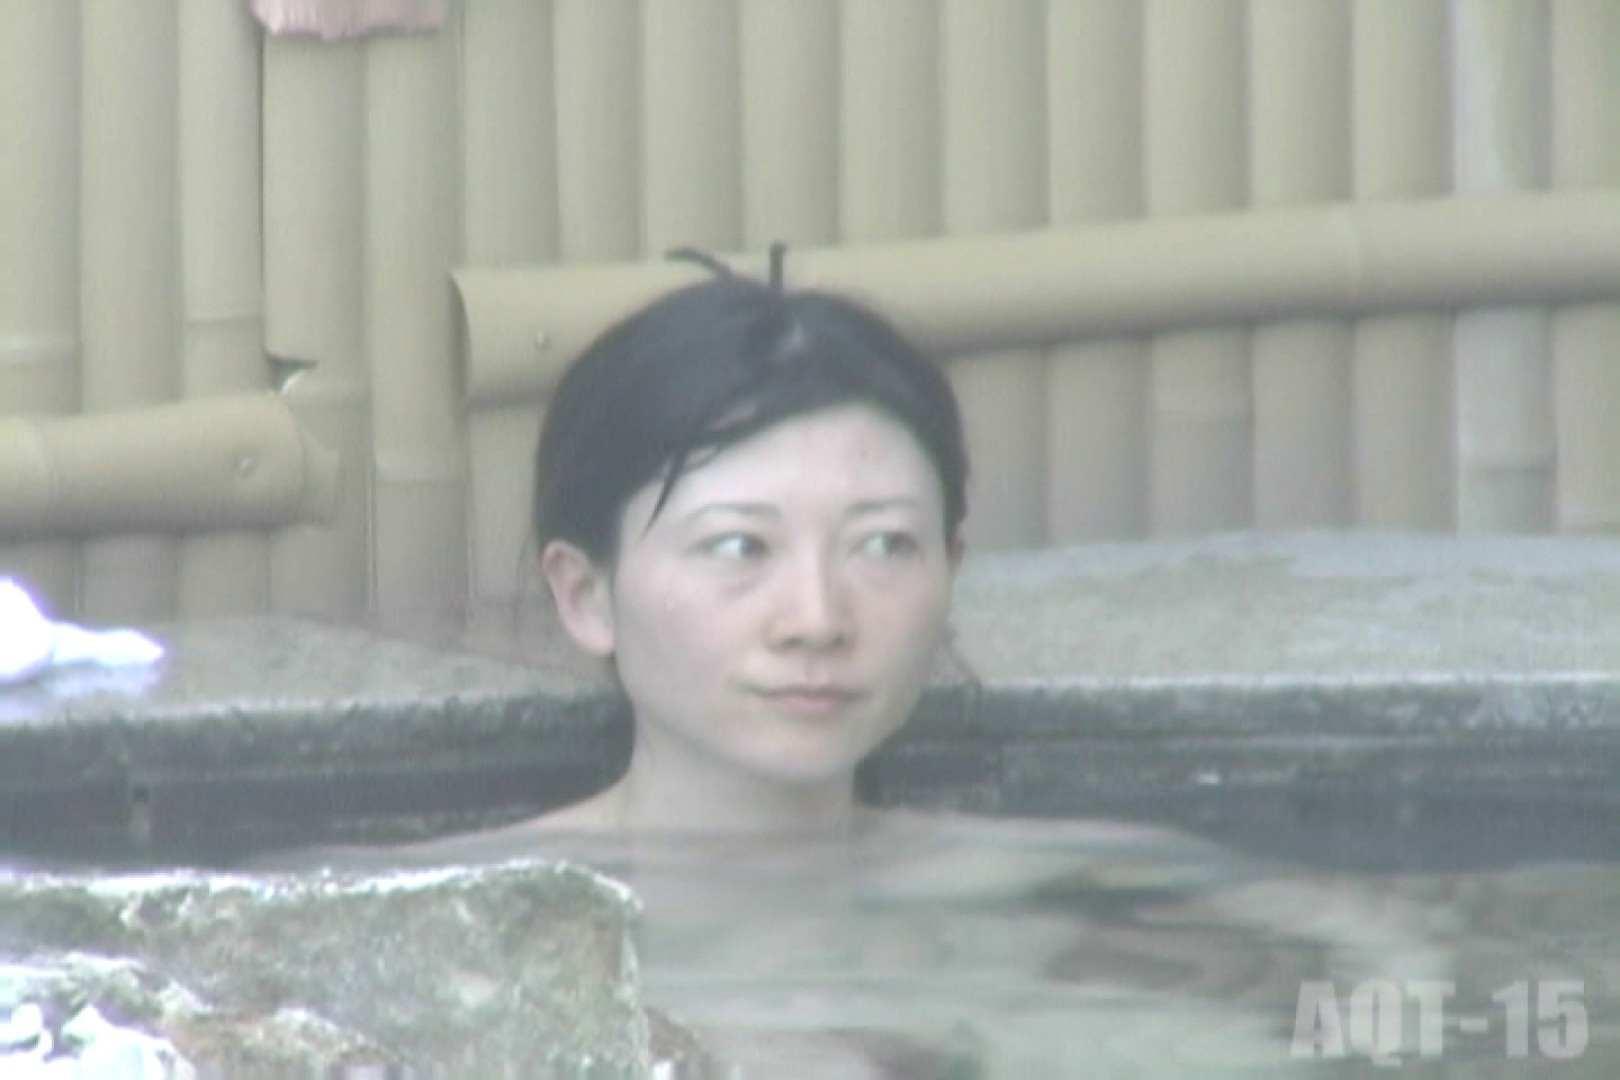 Aquaな露天風呂Vol.835 盗撮シリーズ   露天風呂編  92PIX 37